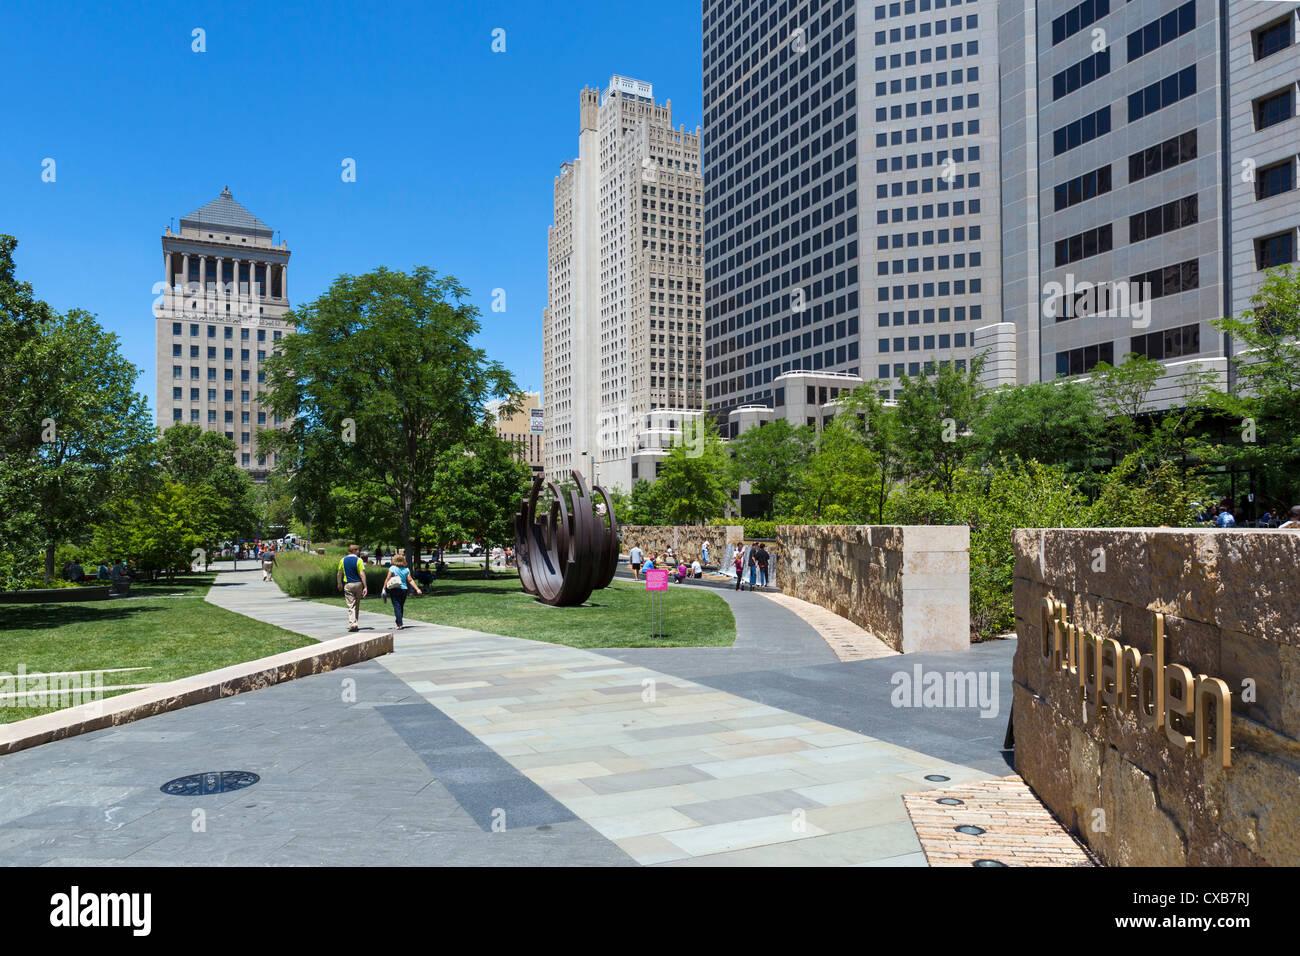 Citygarden Urban Park And Sculpture Garden In Downtown St